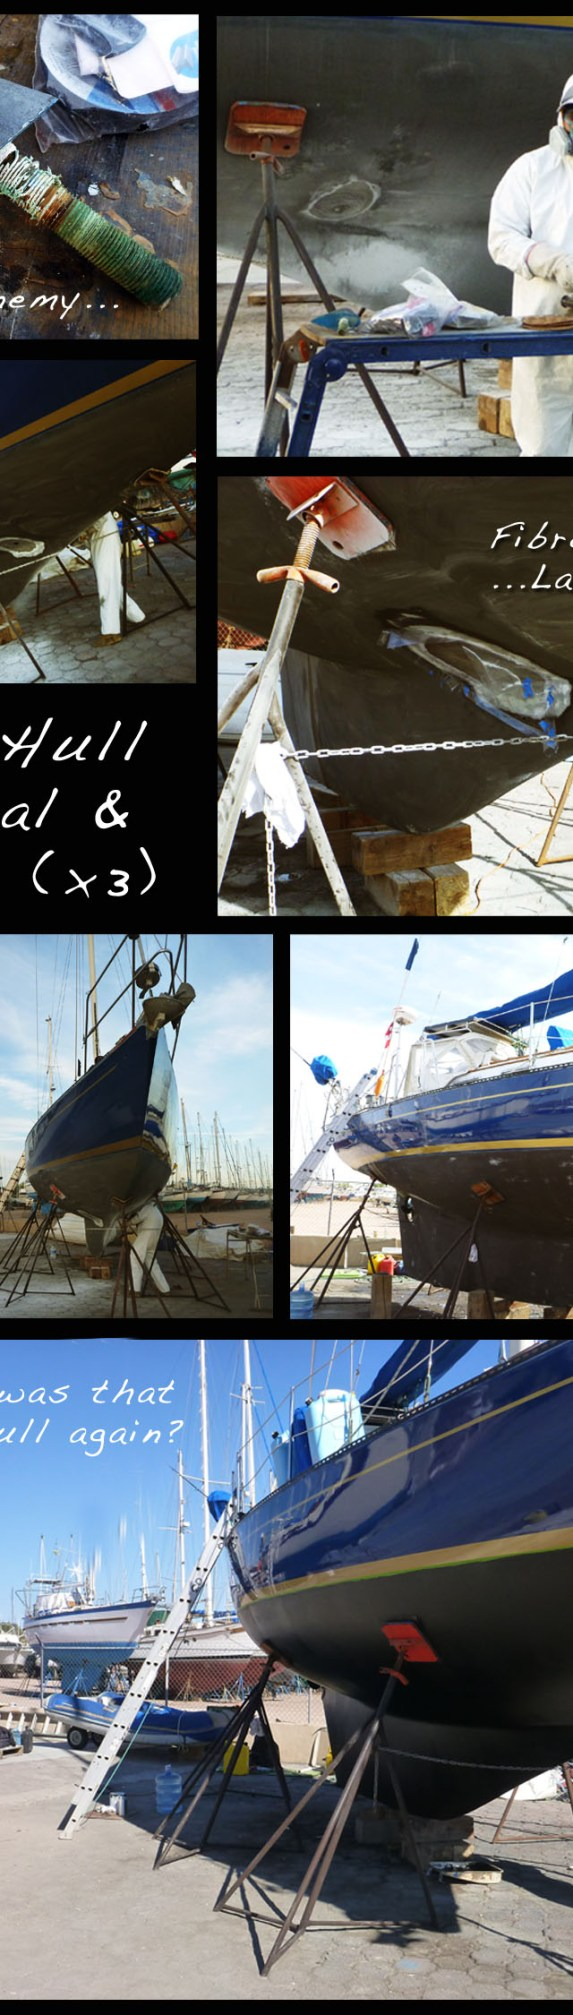 Removing and Repairing Old Thru Hulls NorWest 33